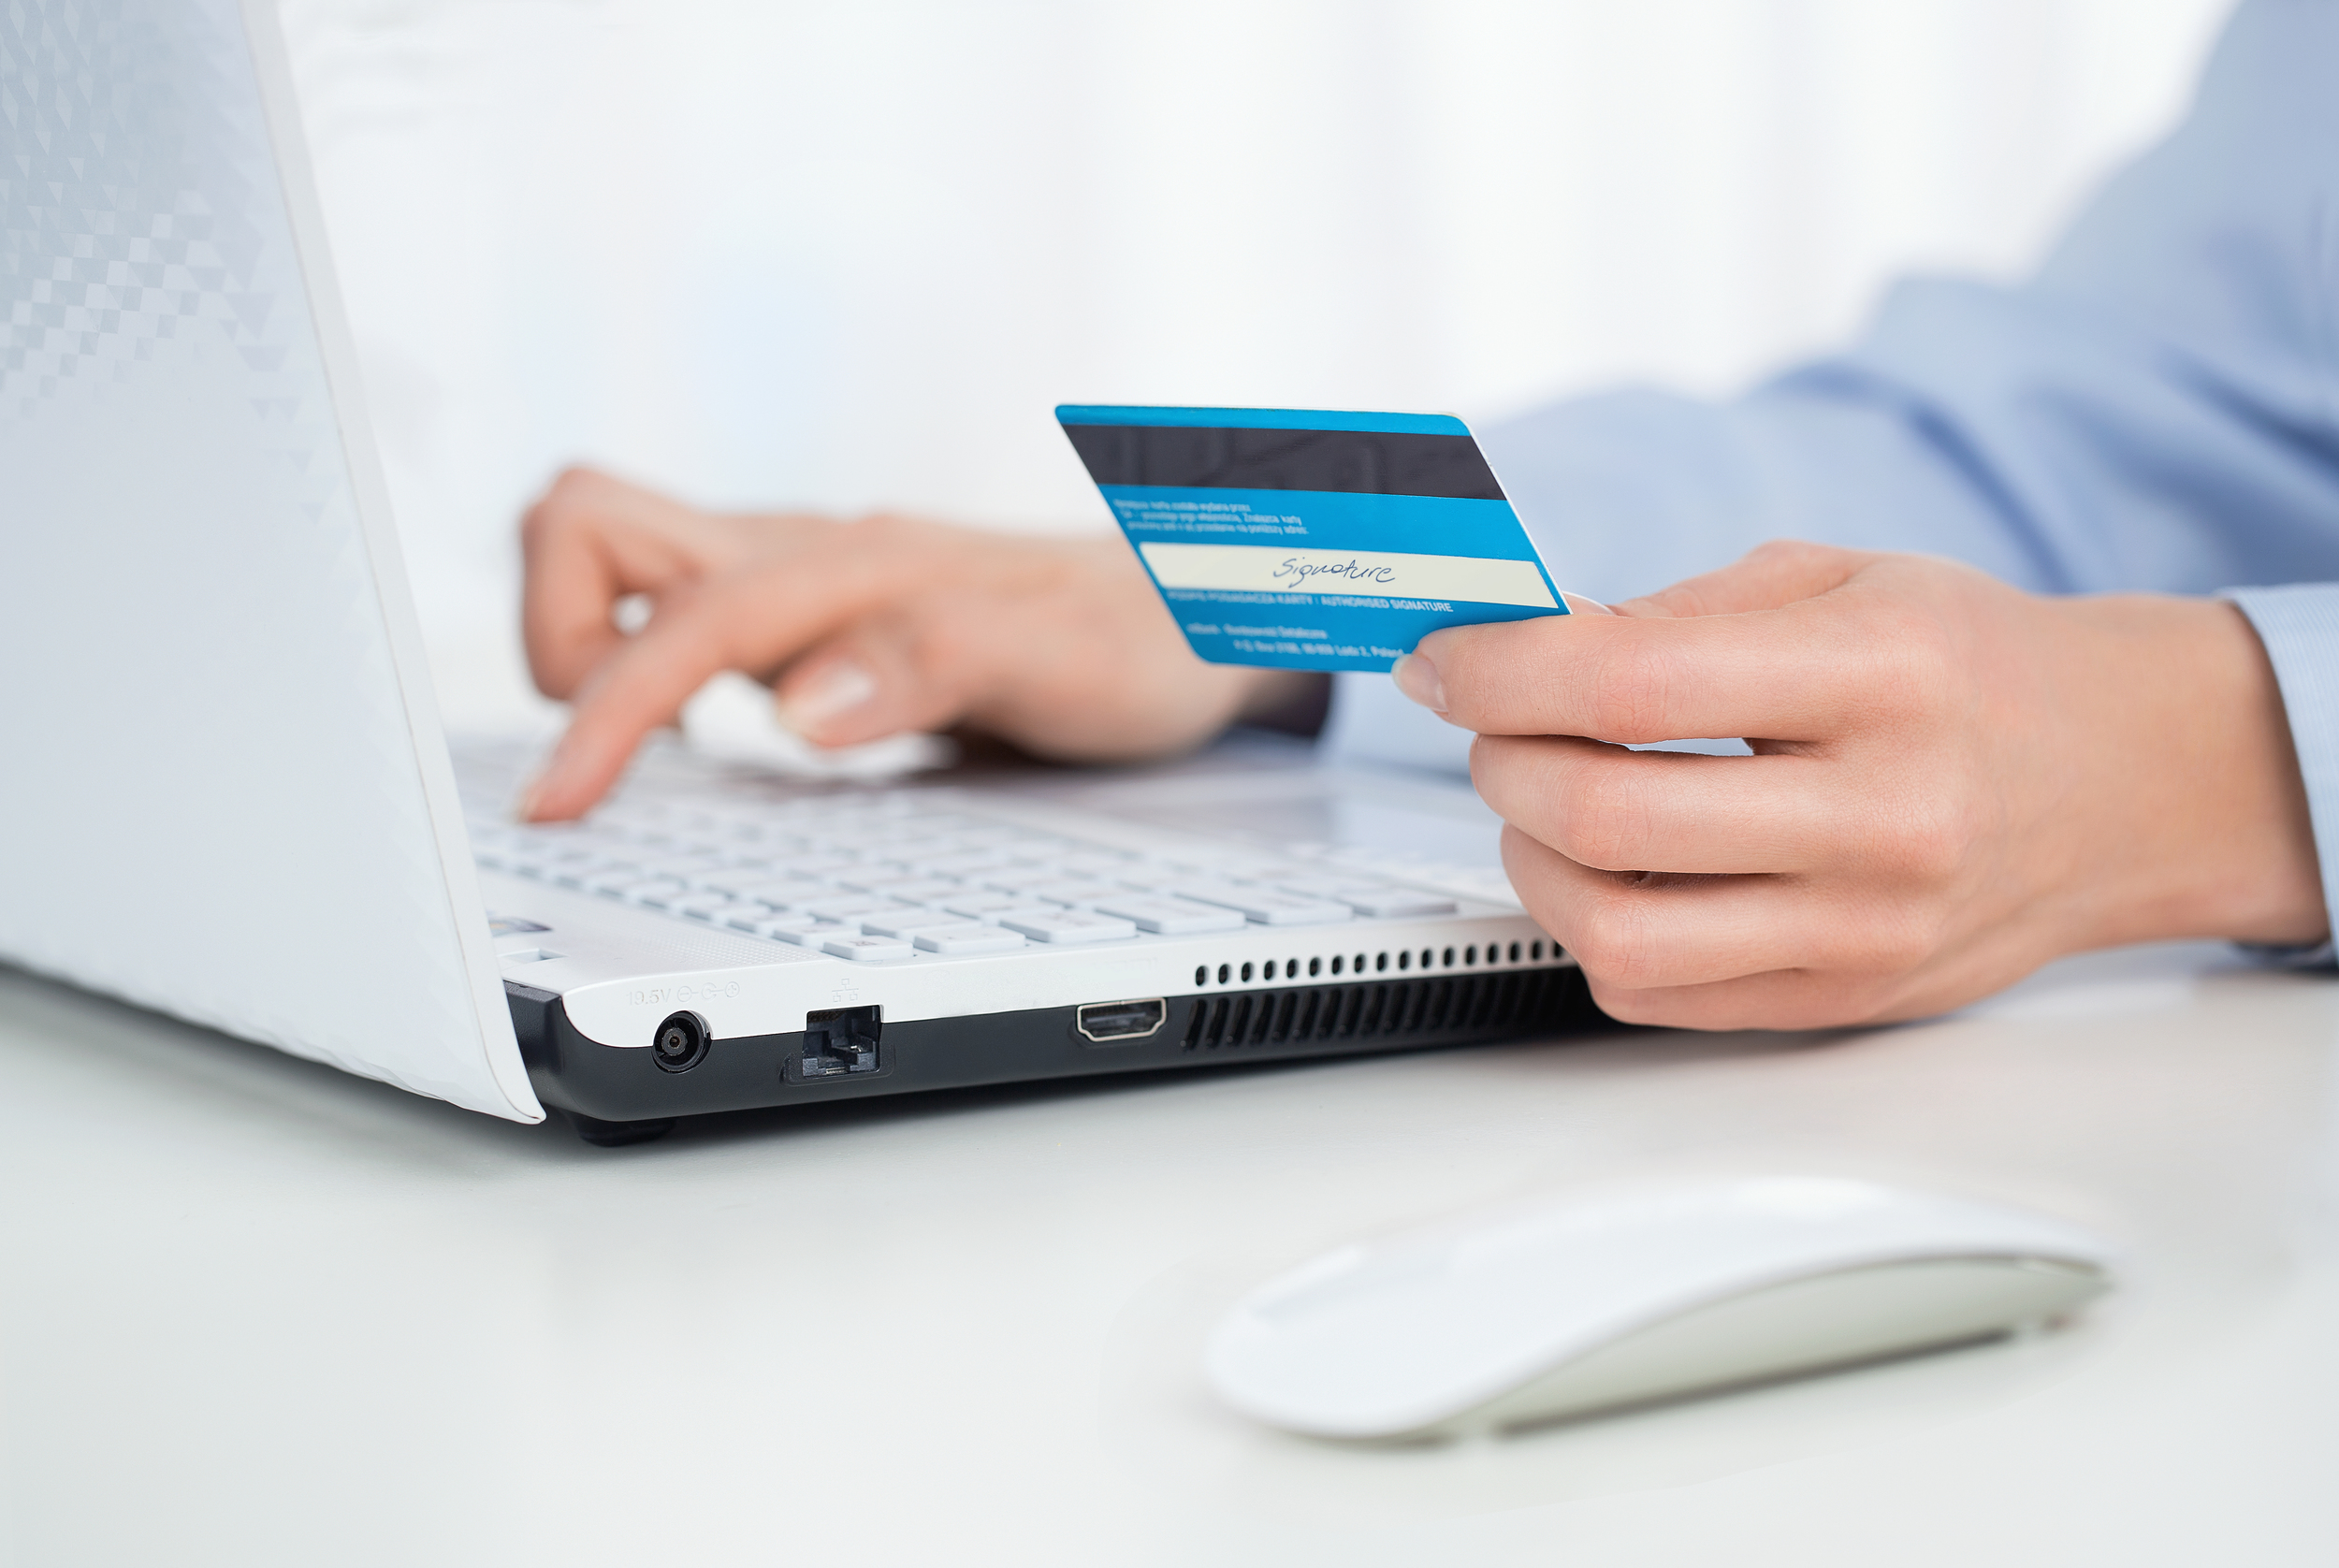 bigstock-Online-Payment-78757847.jpg